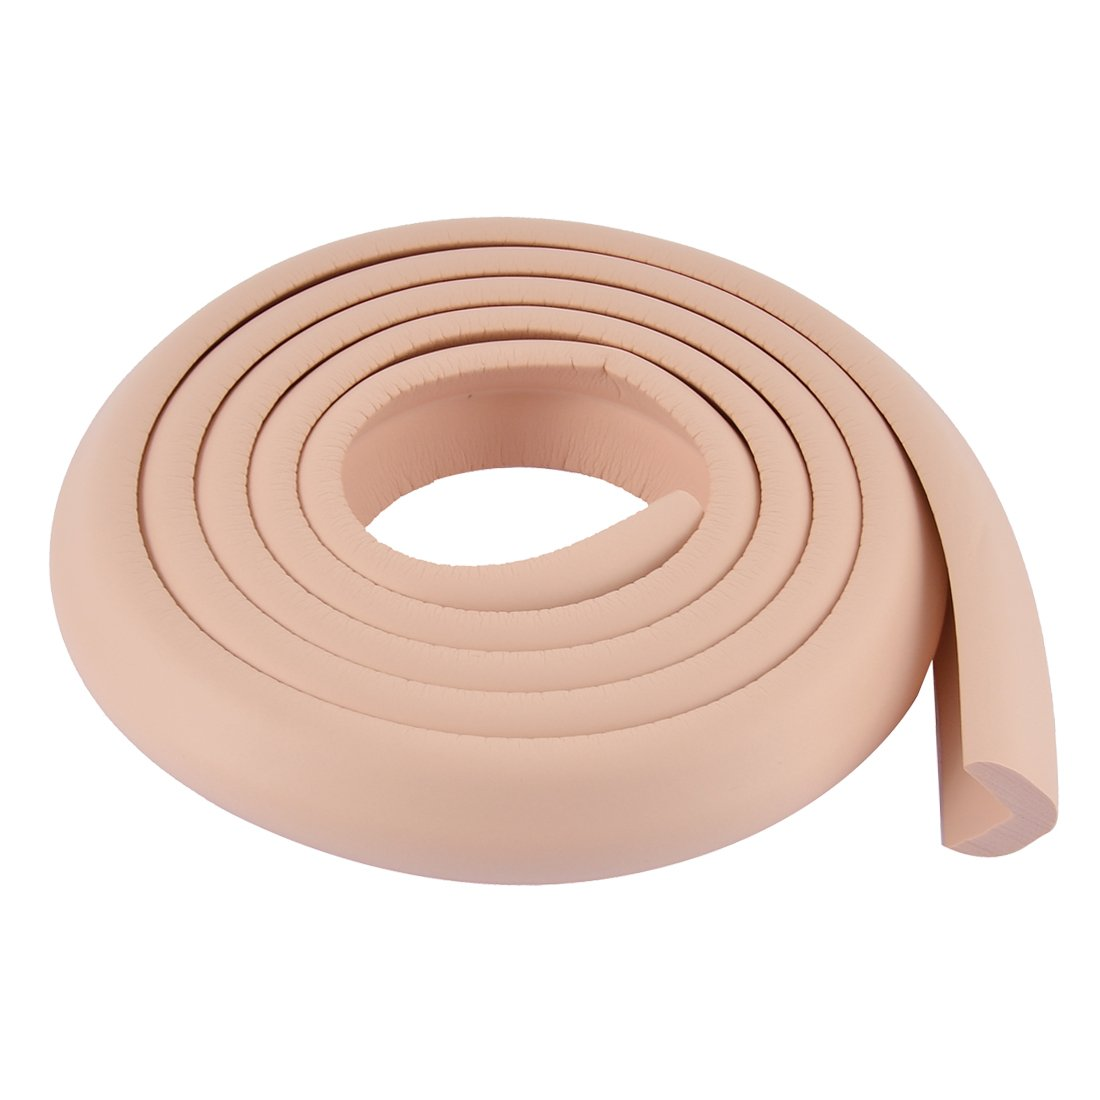 uxcell Furniture Softner Corner Edge Safety Guard Protector Cushion Black